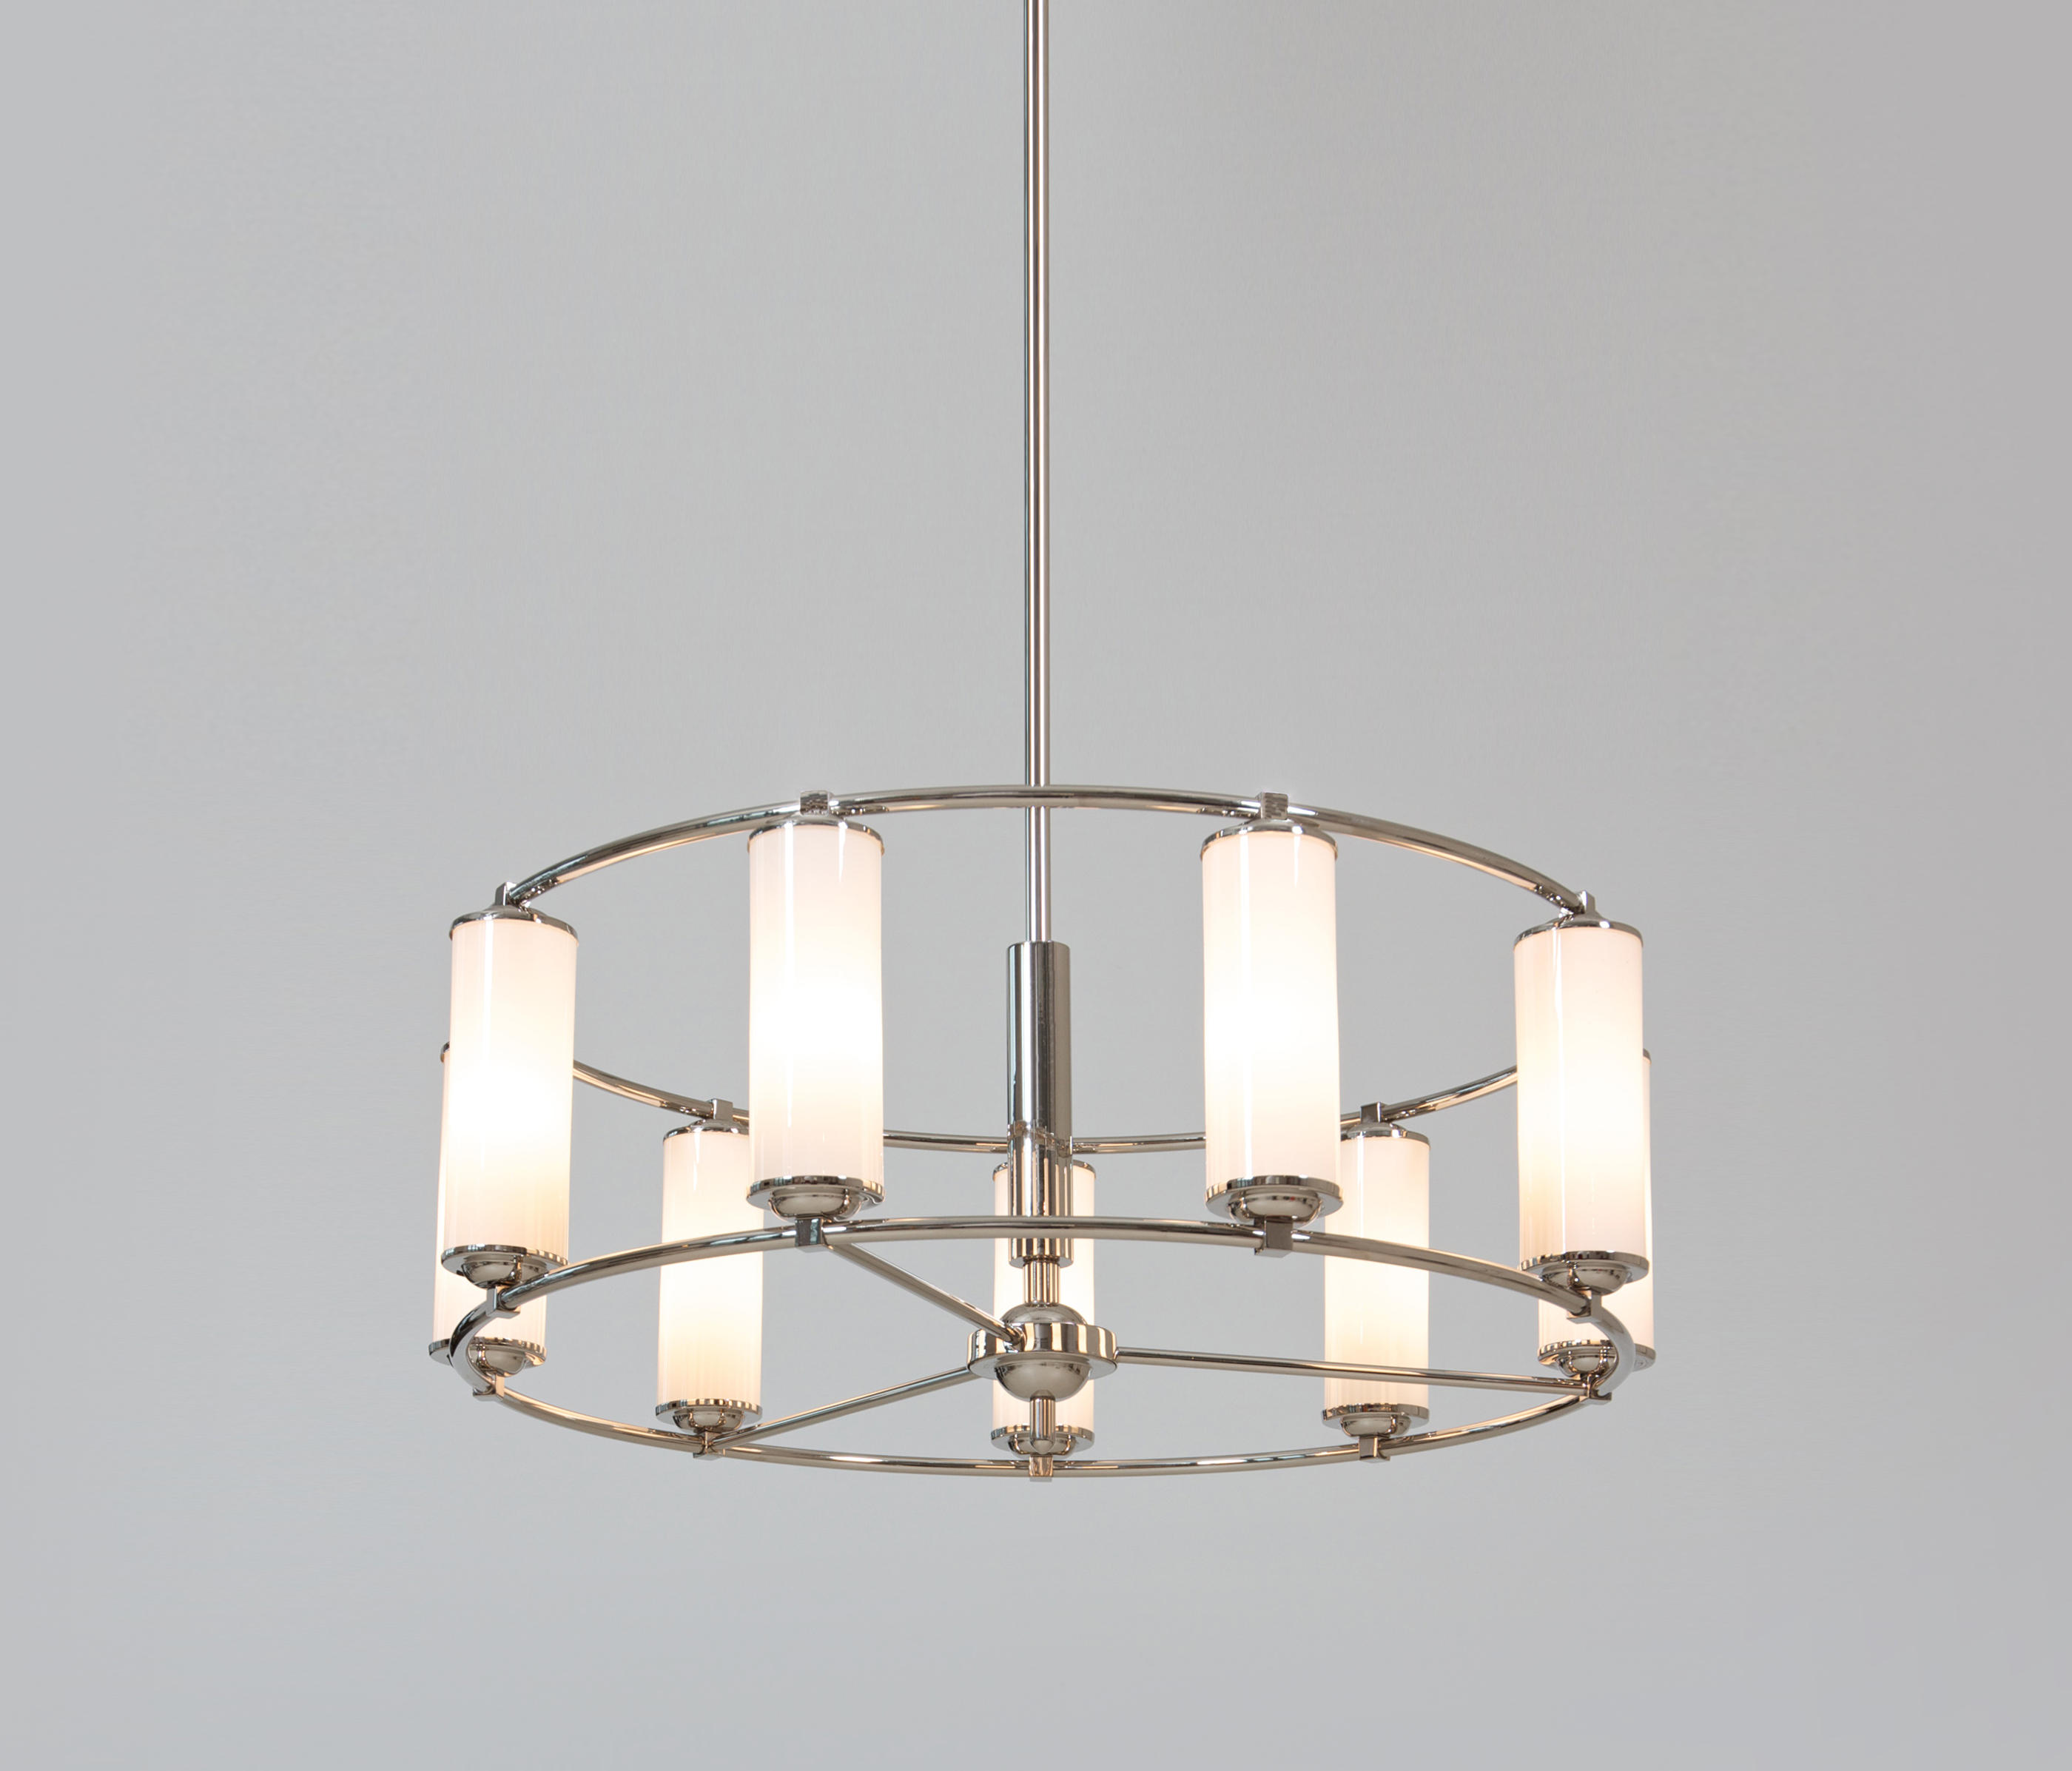 Bauhaus B Design Clic With